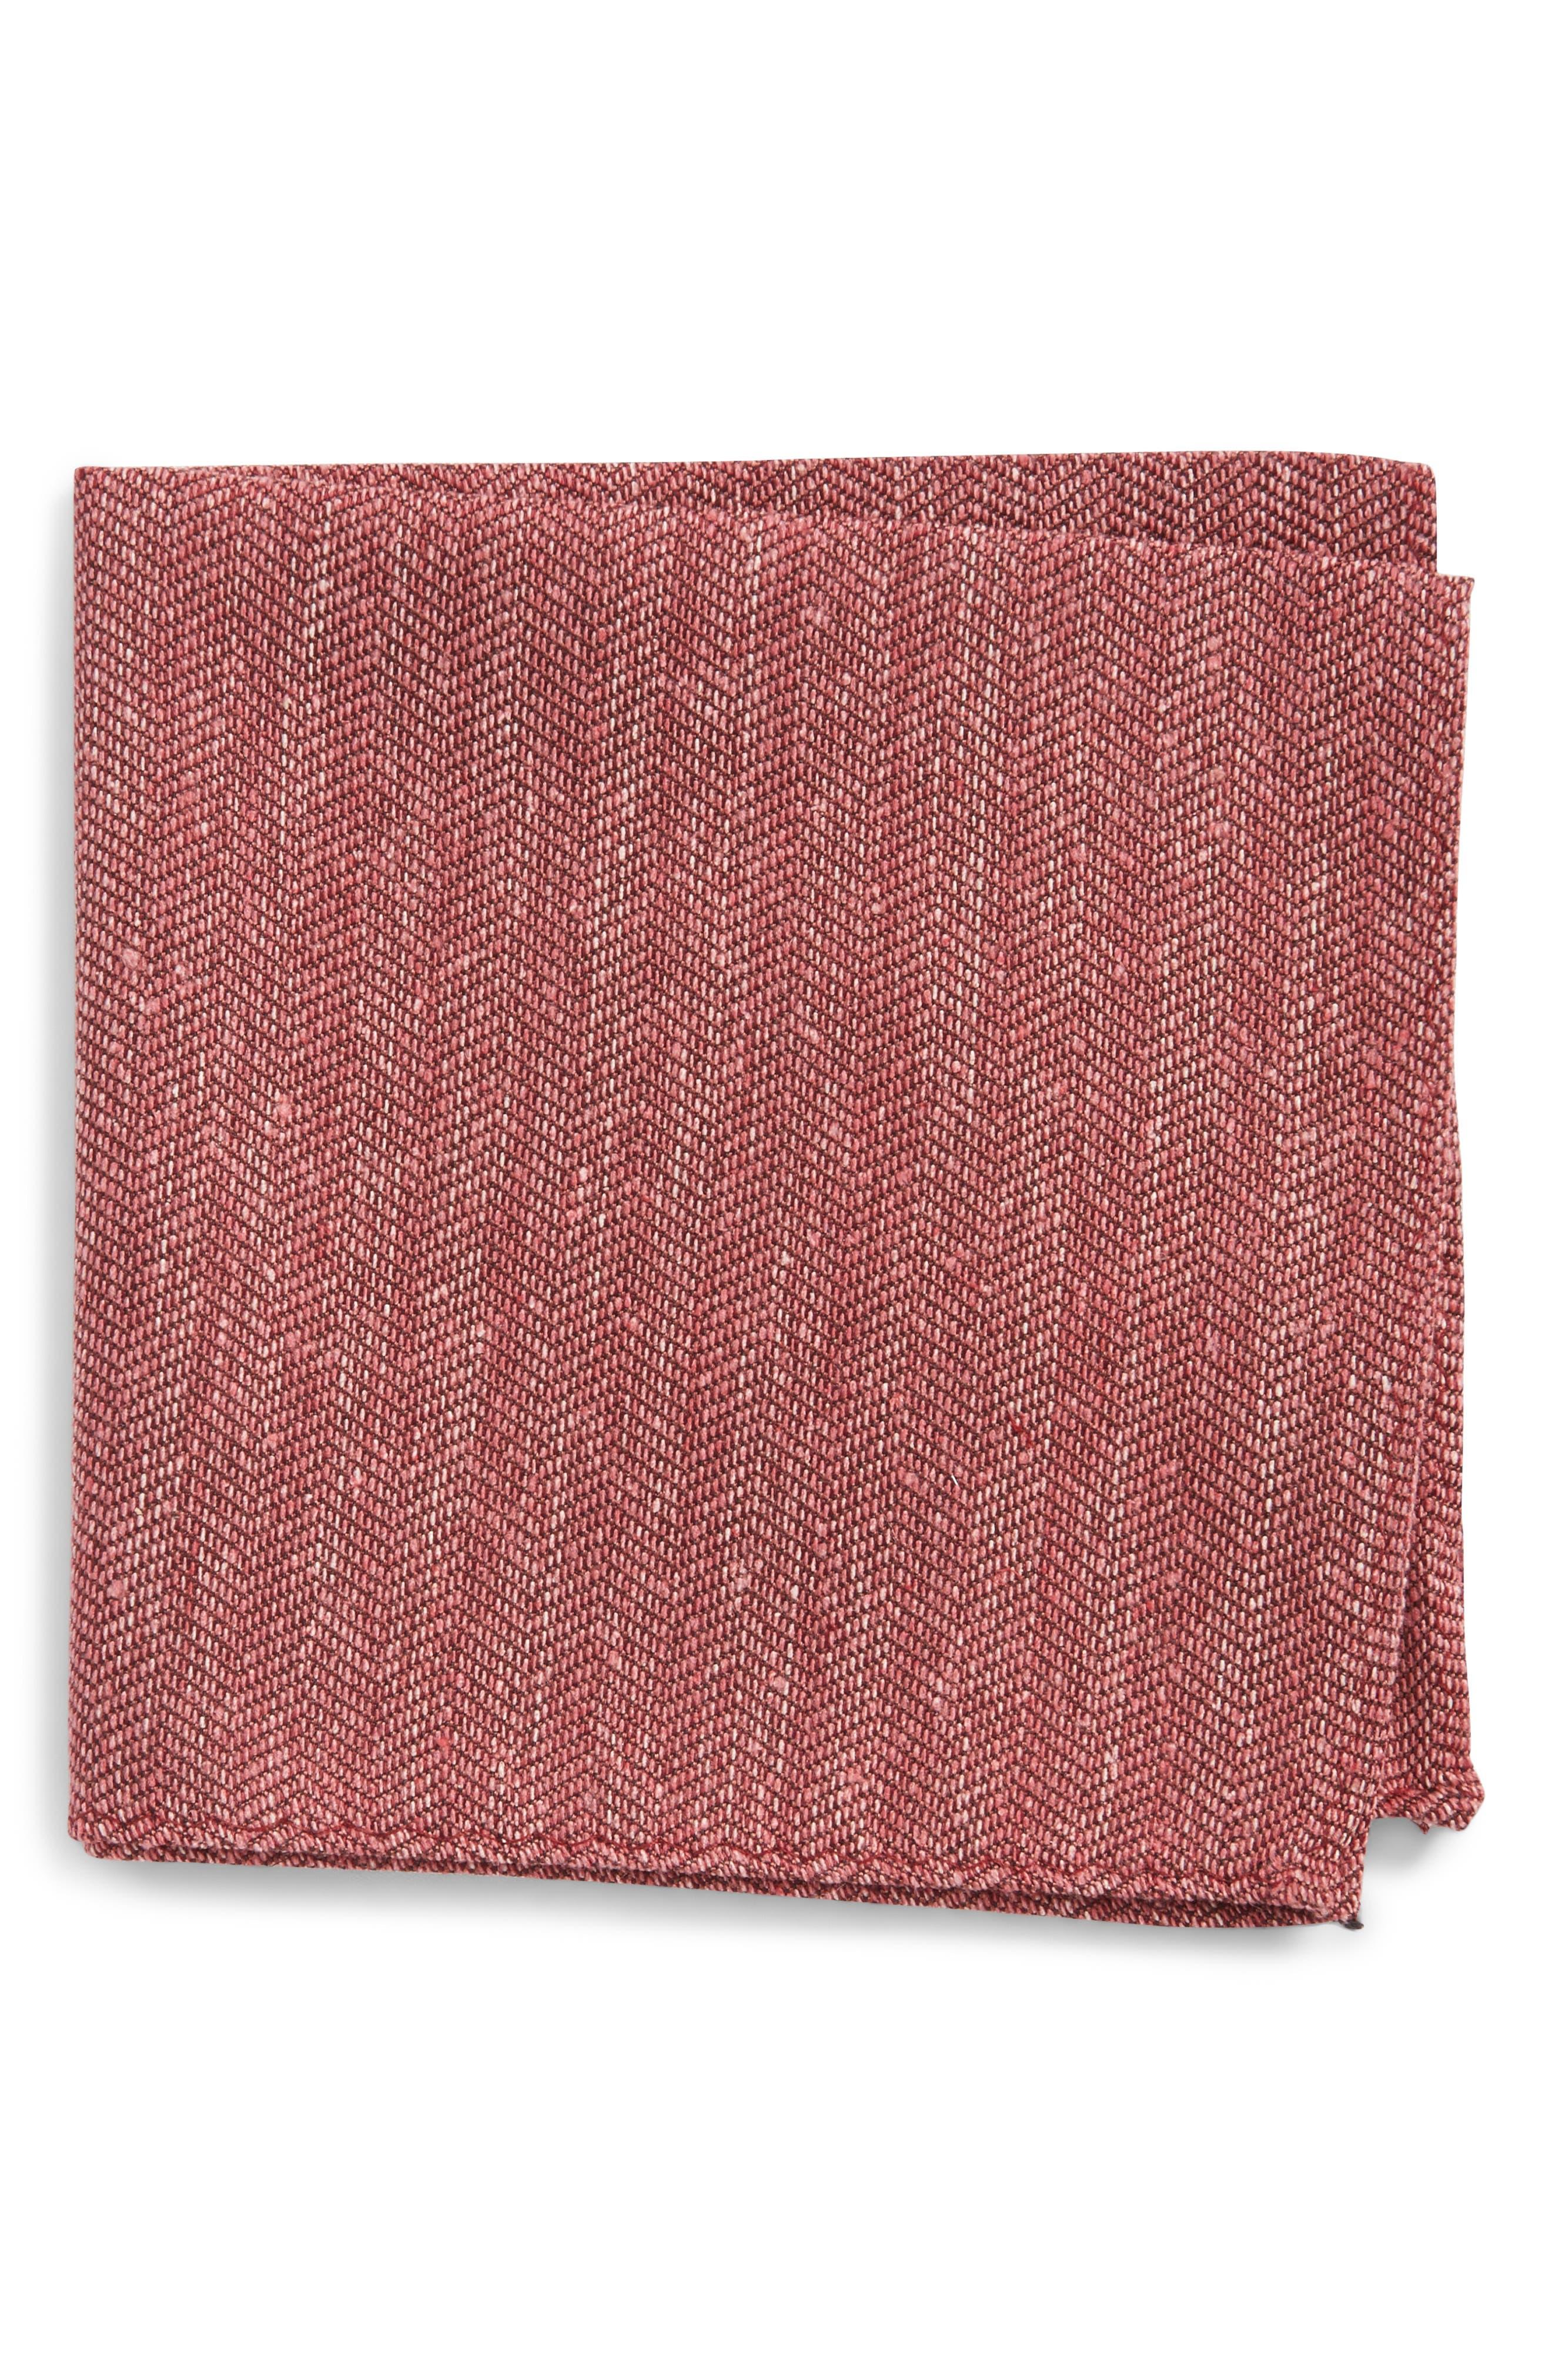 Main Image - The Tie Bar Threaded Zigzag Silk Pocket Square